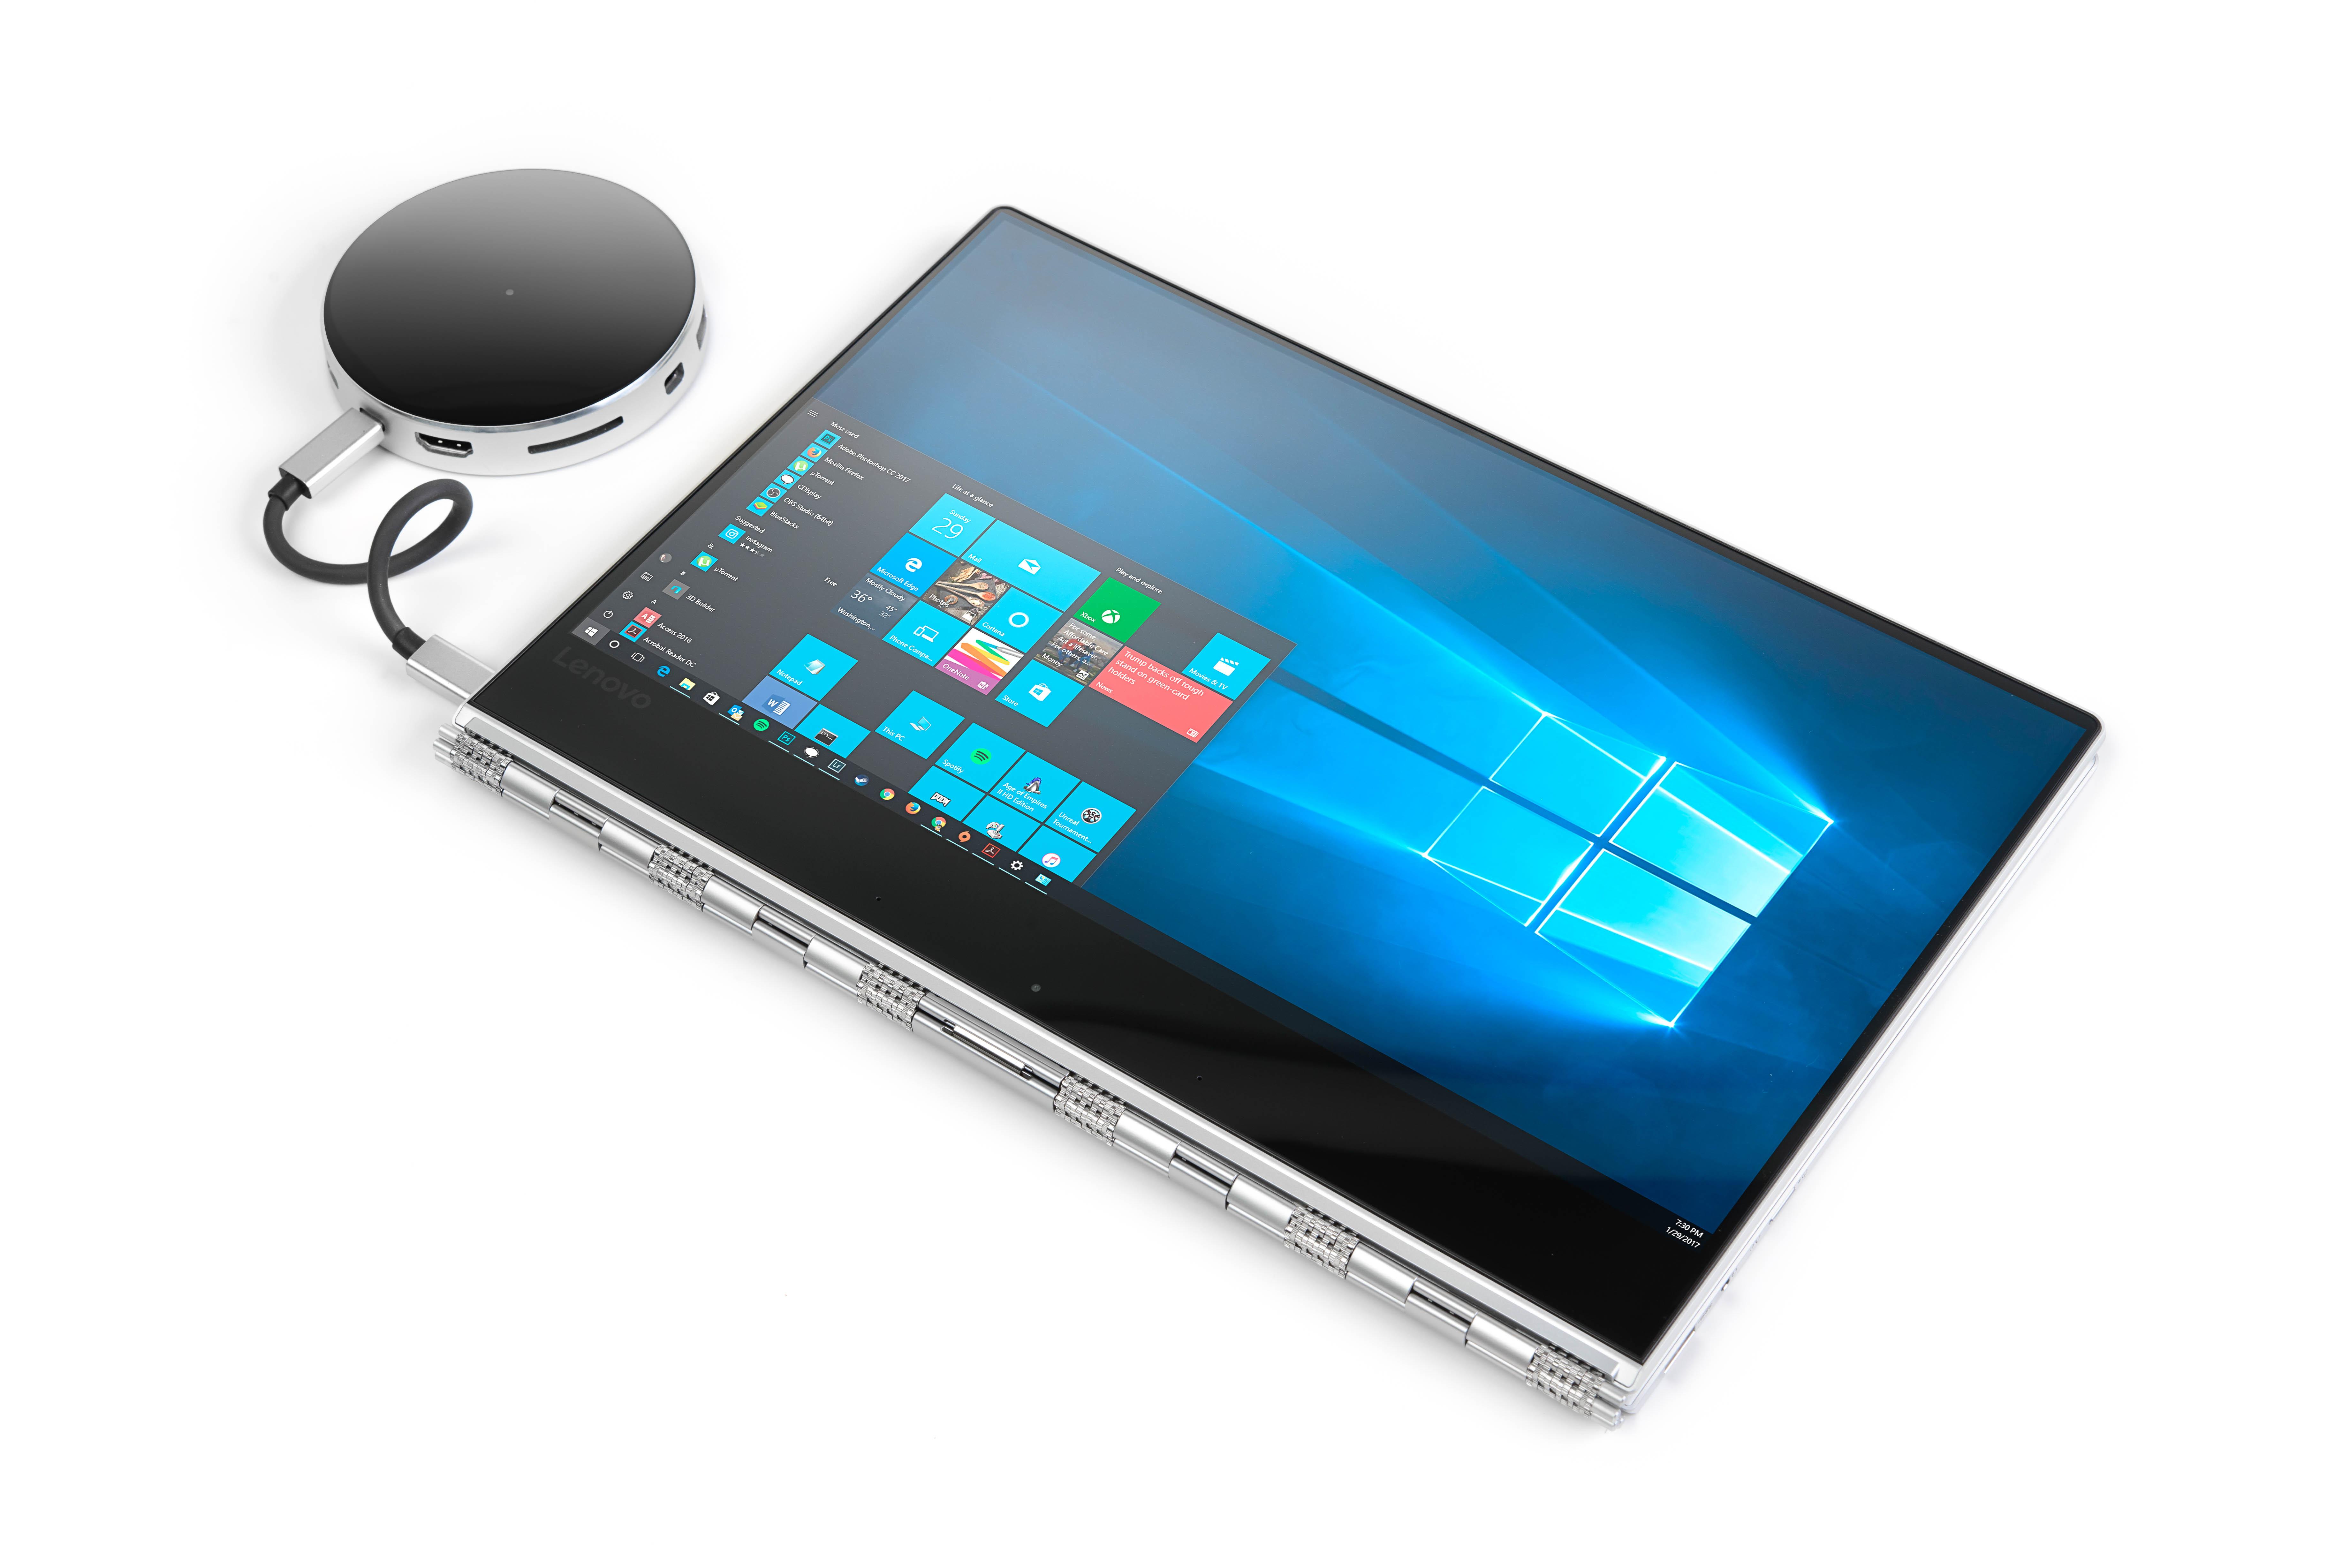 Thunderbolt 3 USB-C Hub connected to HP monitors & Lenovo Thinkpad Laptop